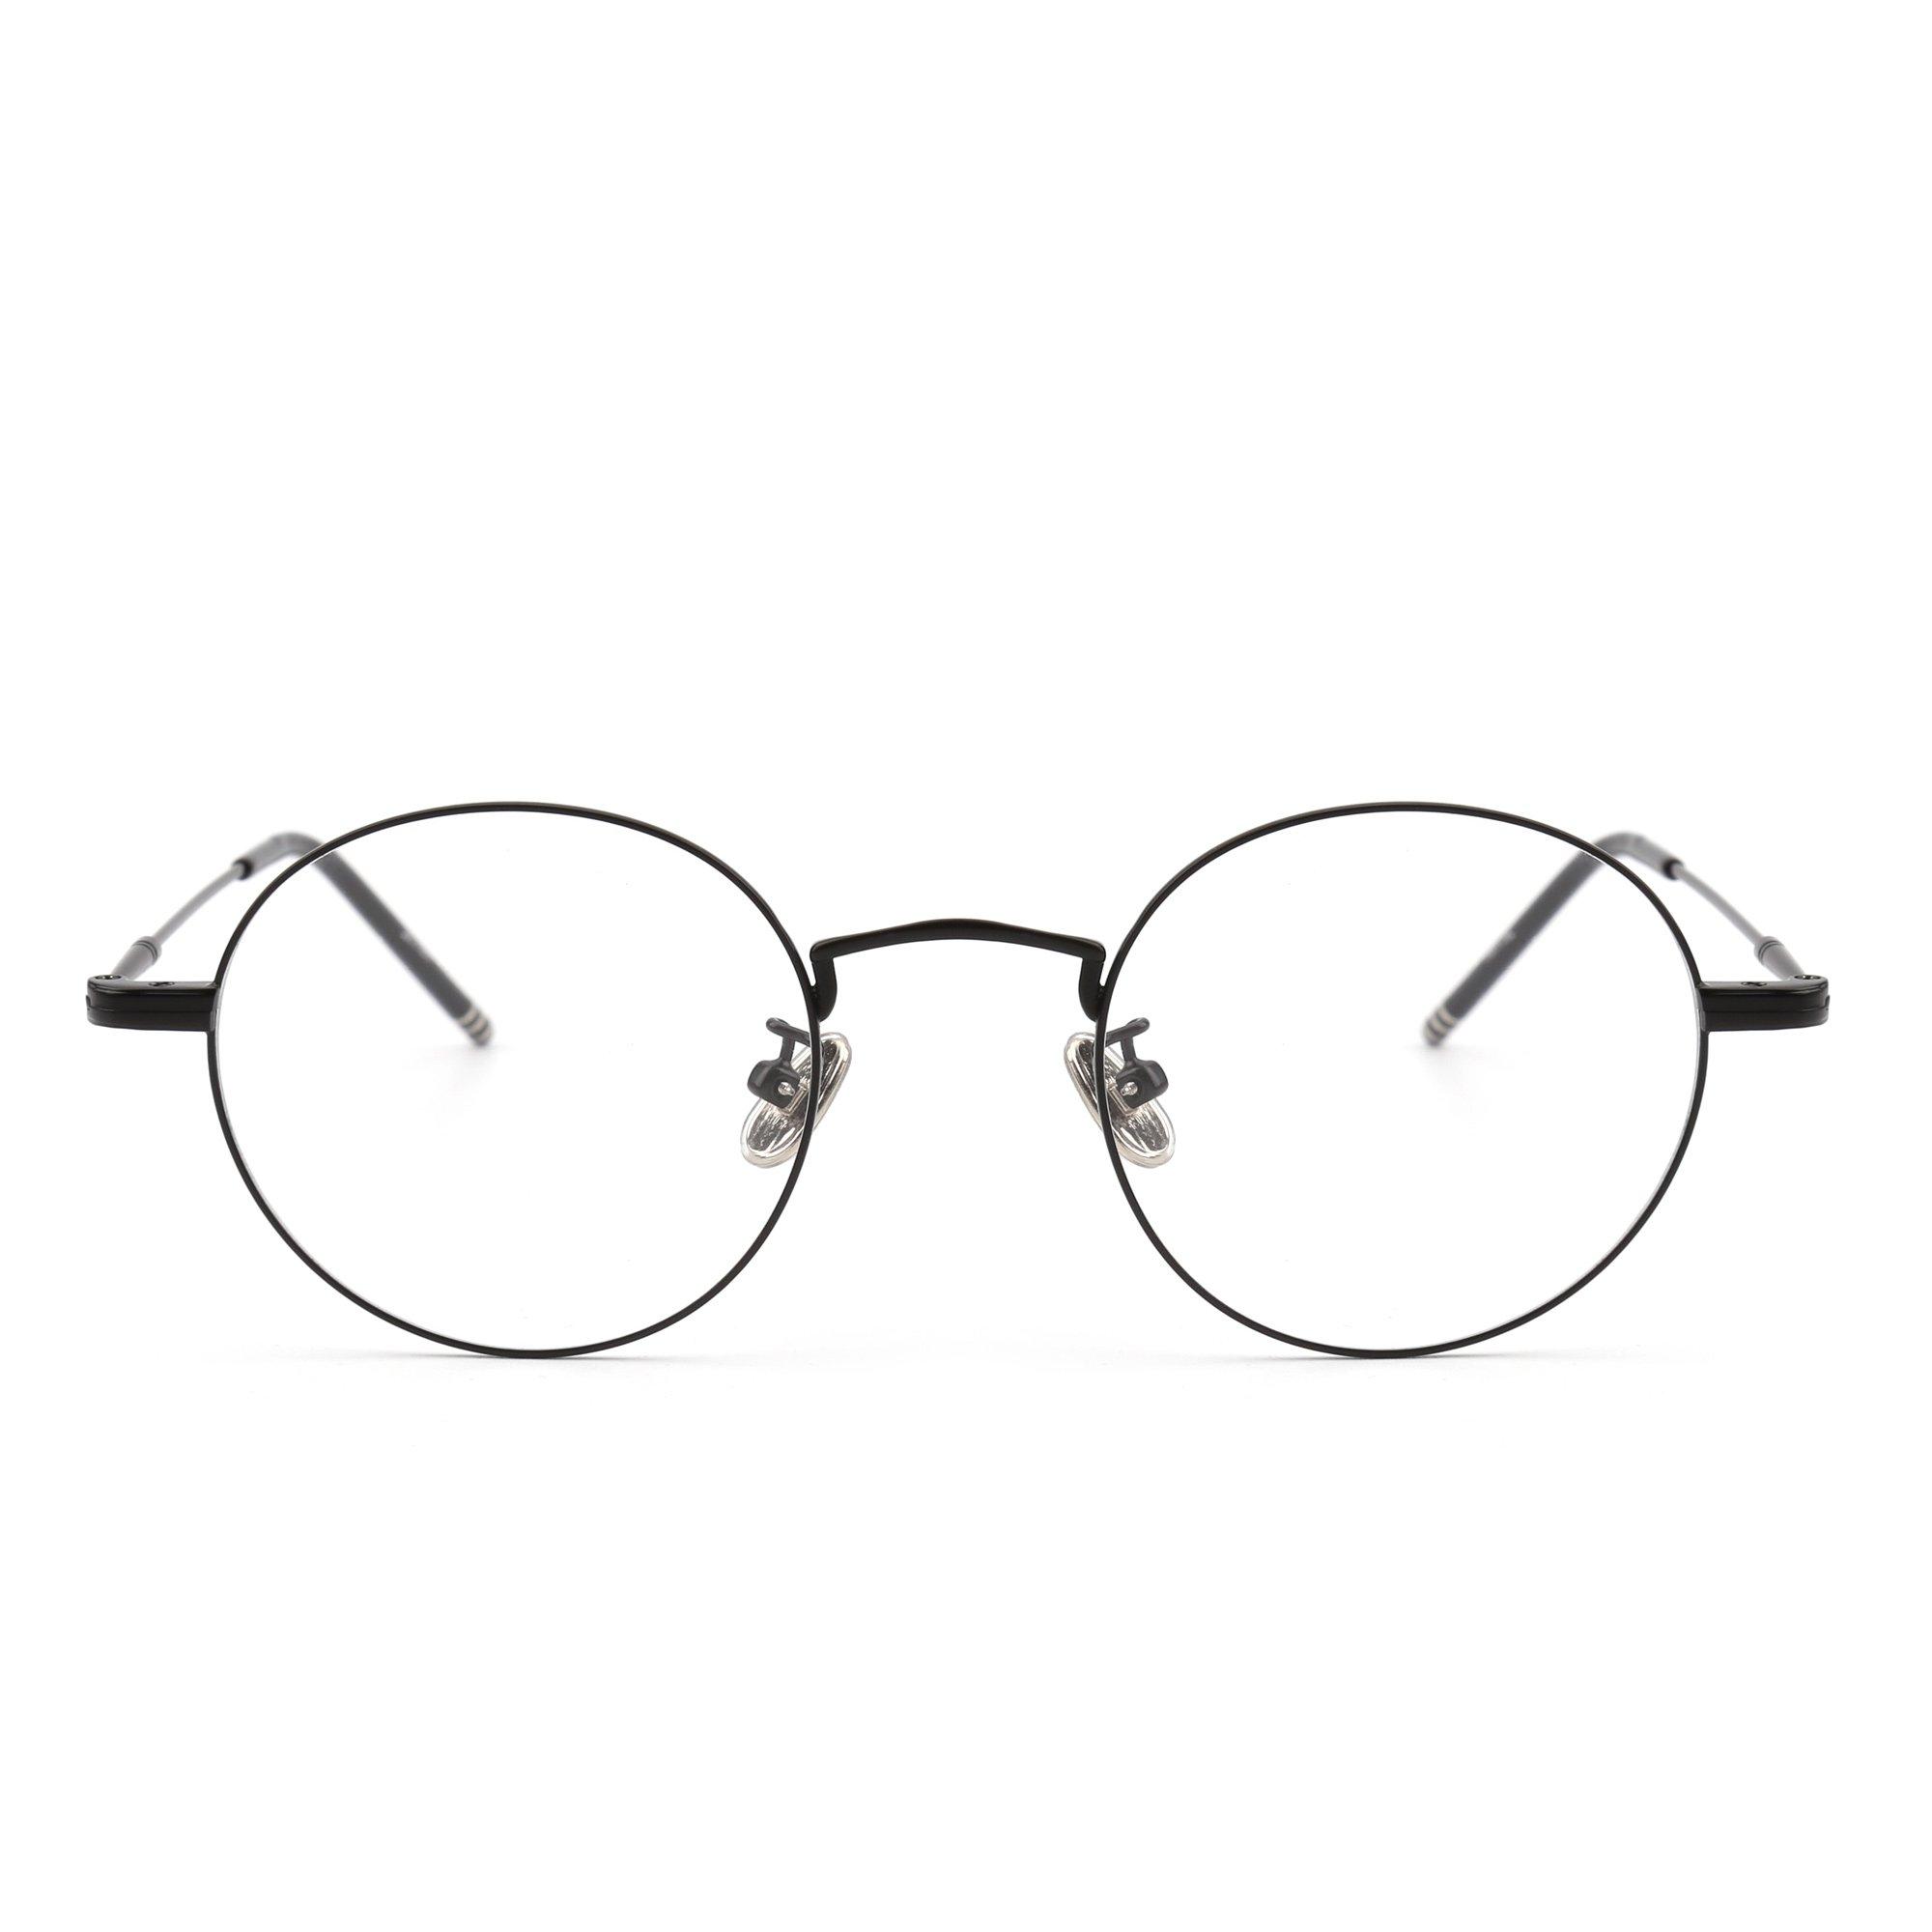 Round Wire Rim Glasses Circle Frame Clear Lens Eyeglasses Optical Eyewear Women Men (Black / Clear)